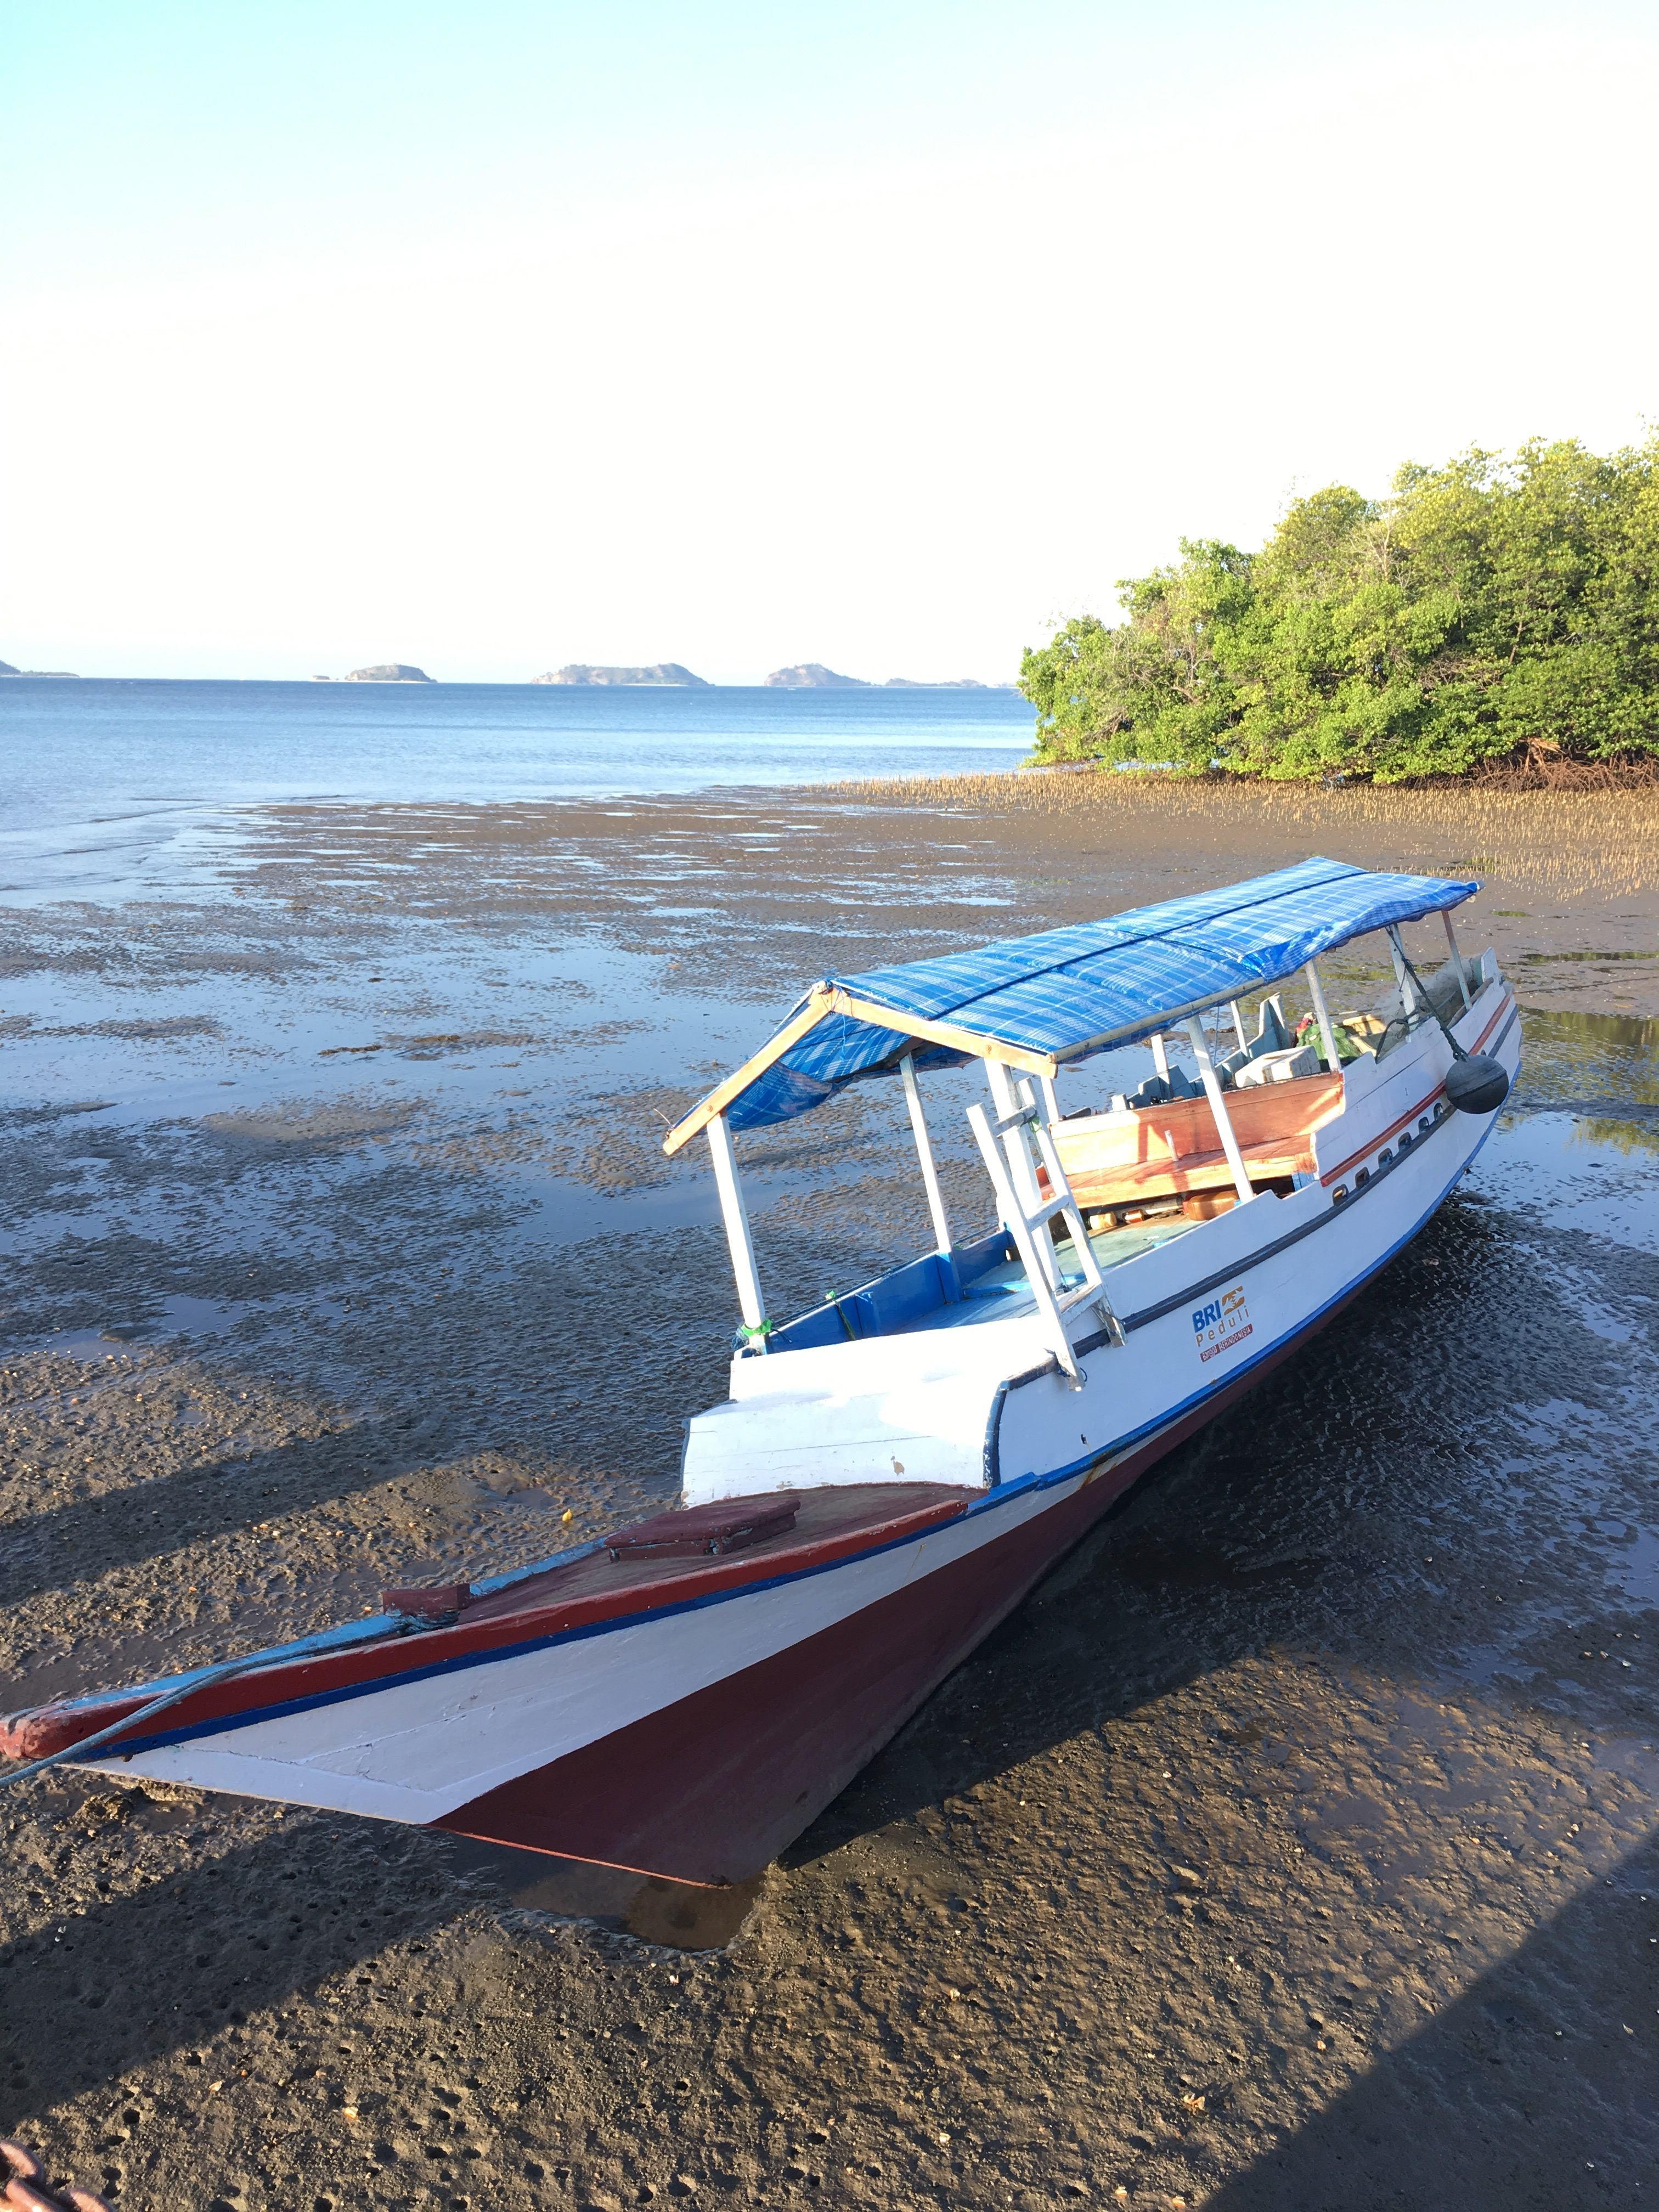 10. Indonesia. Maree